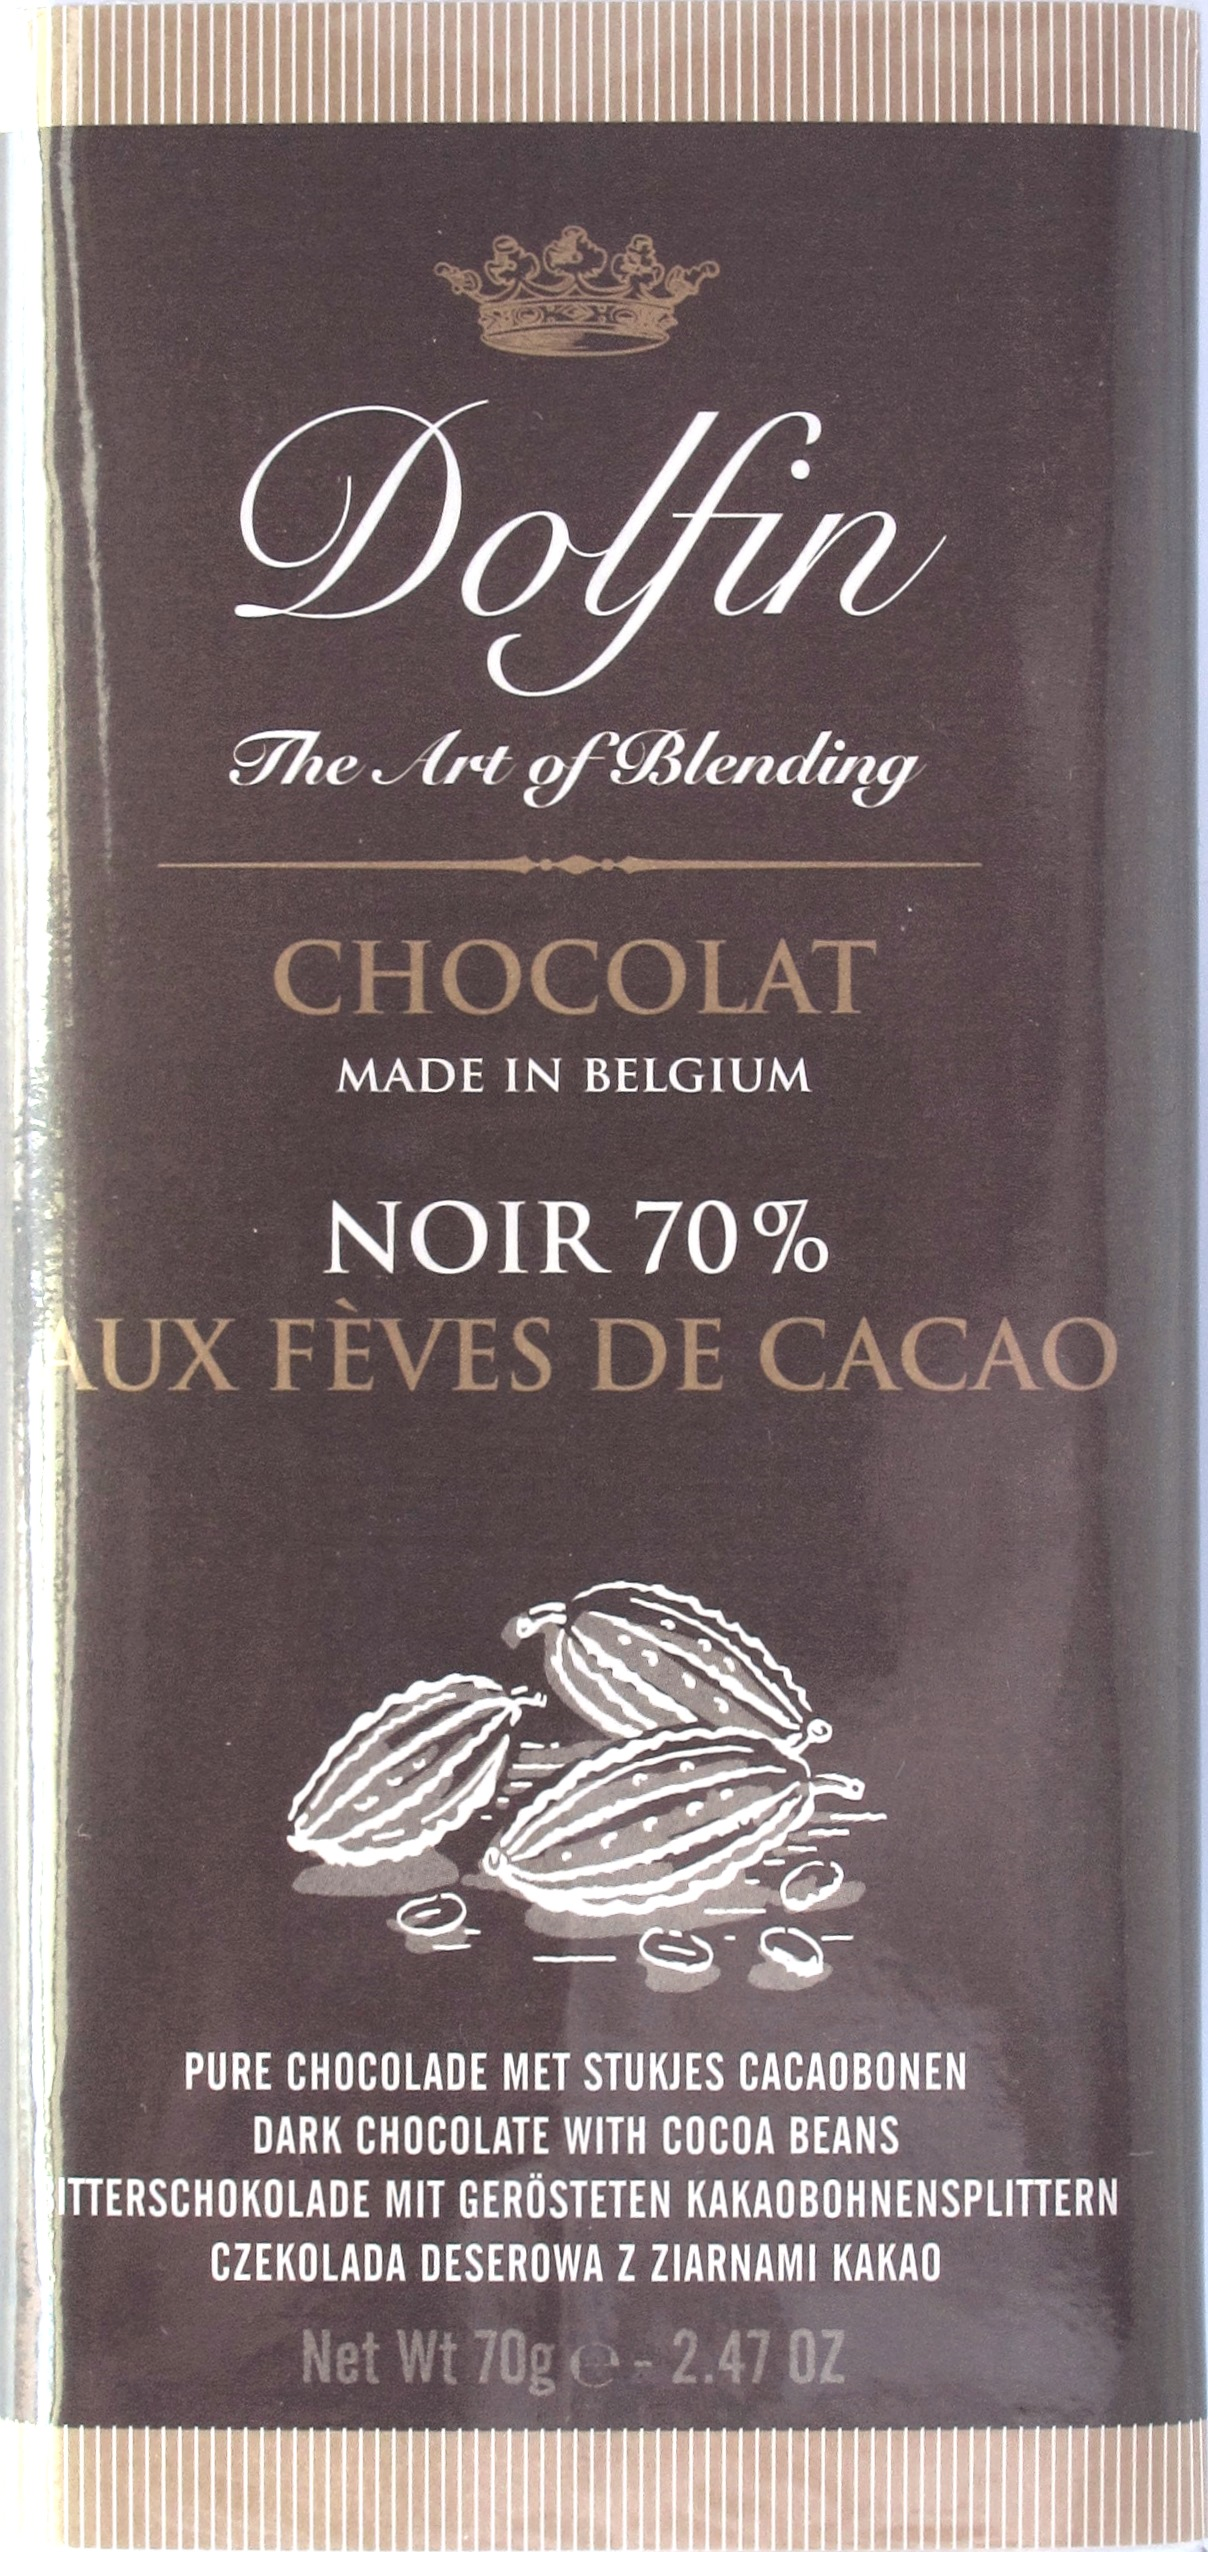 Schokolade Dolfin Noir 70%